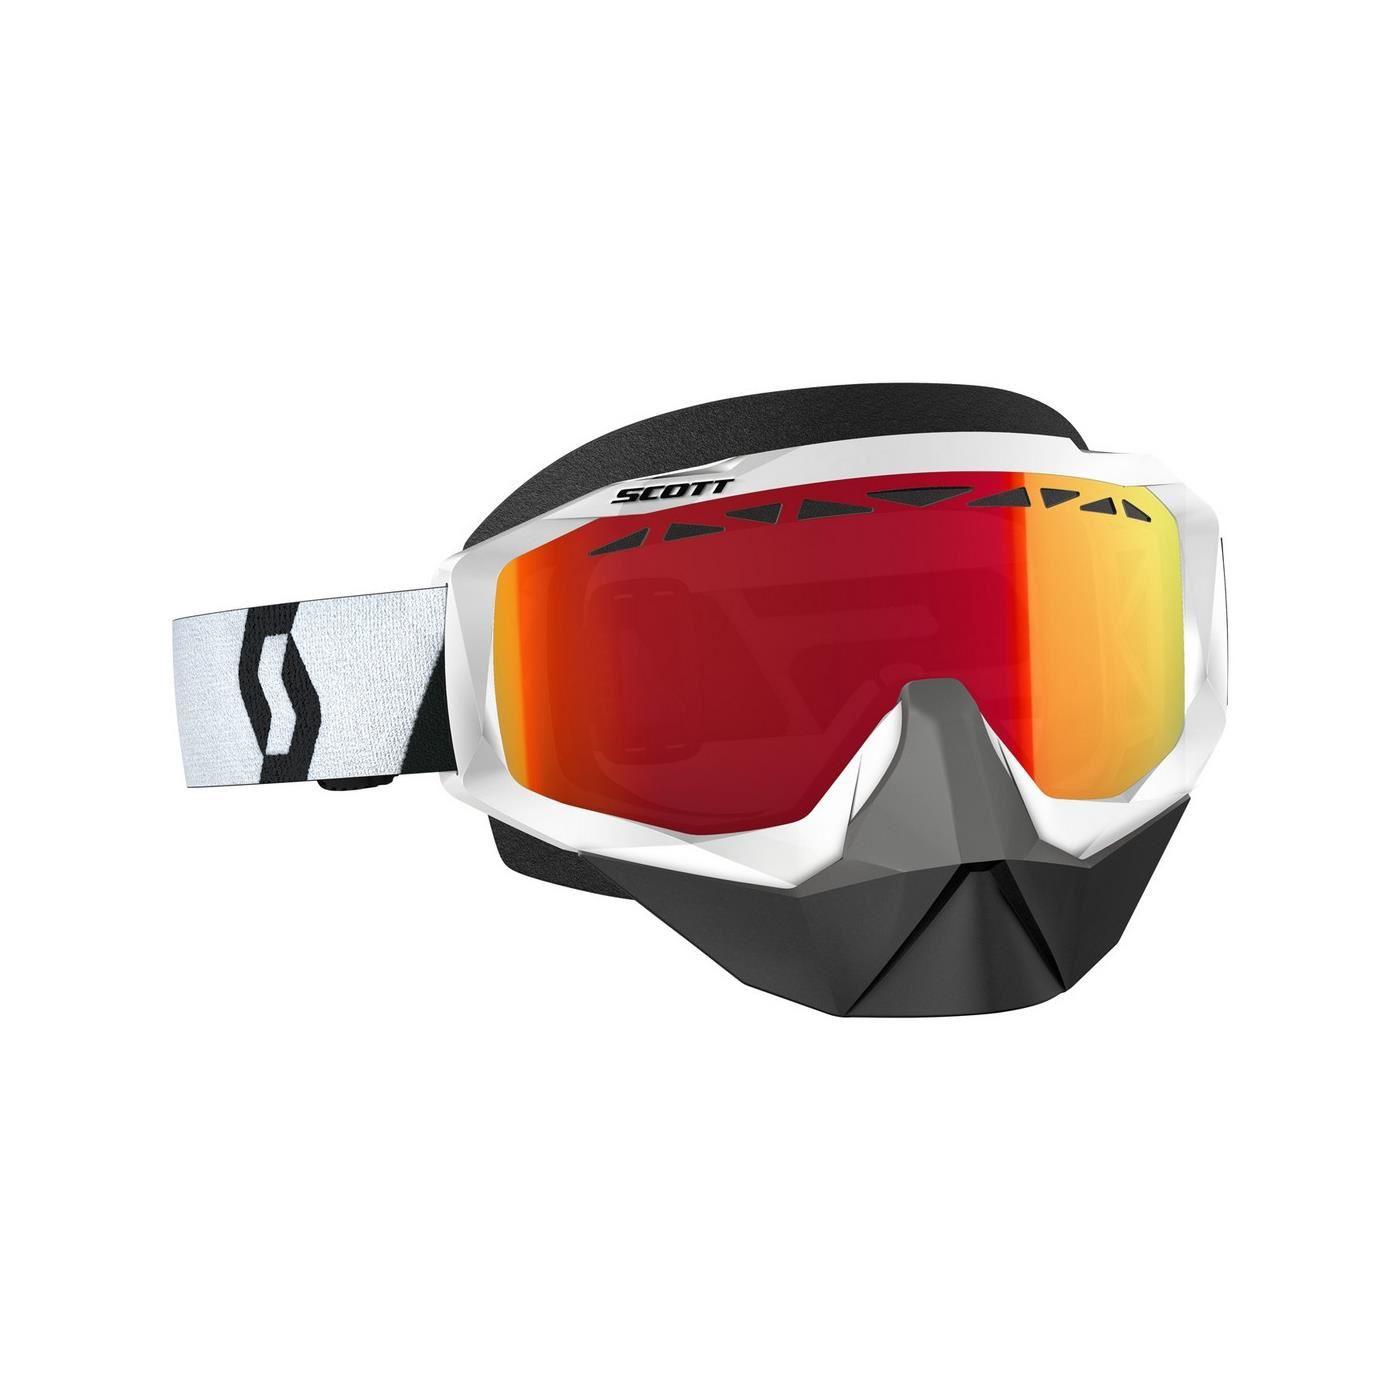 Bilde for kategori Snøscooter briller